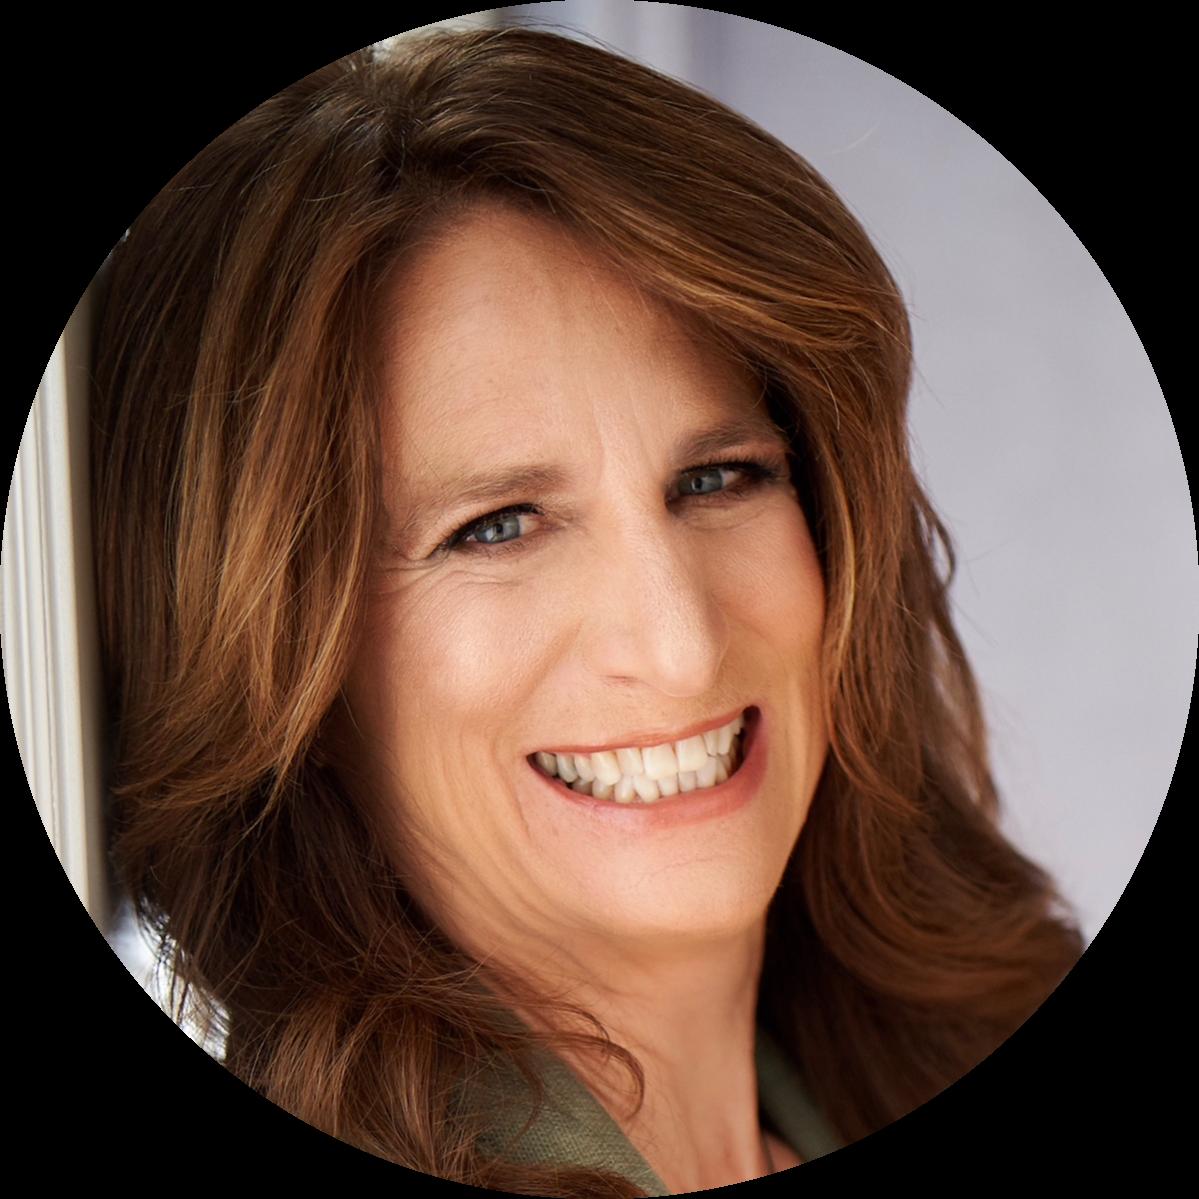 Cindy Goldrich, Ed.M, ADHD-CCSP